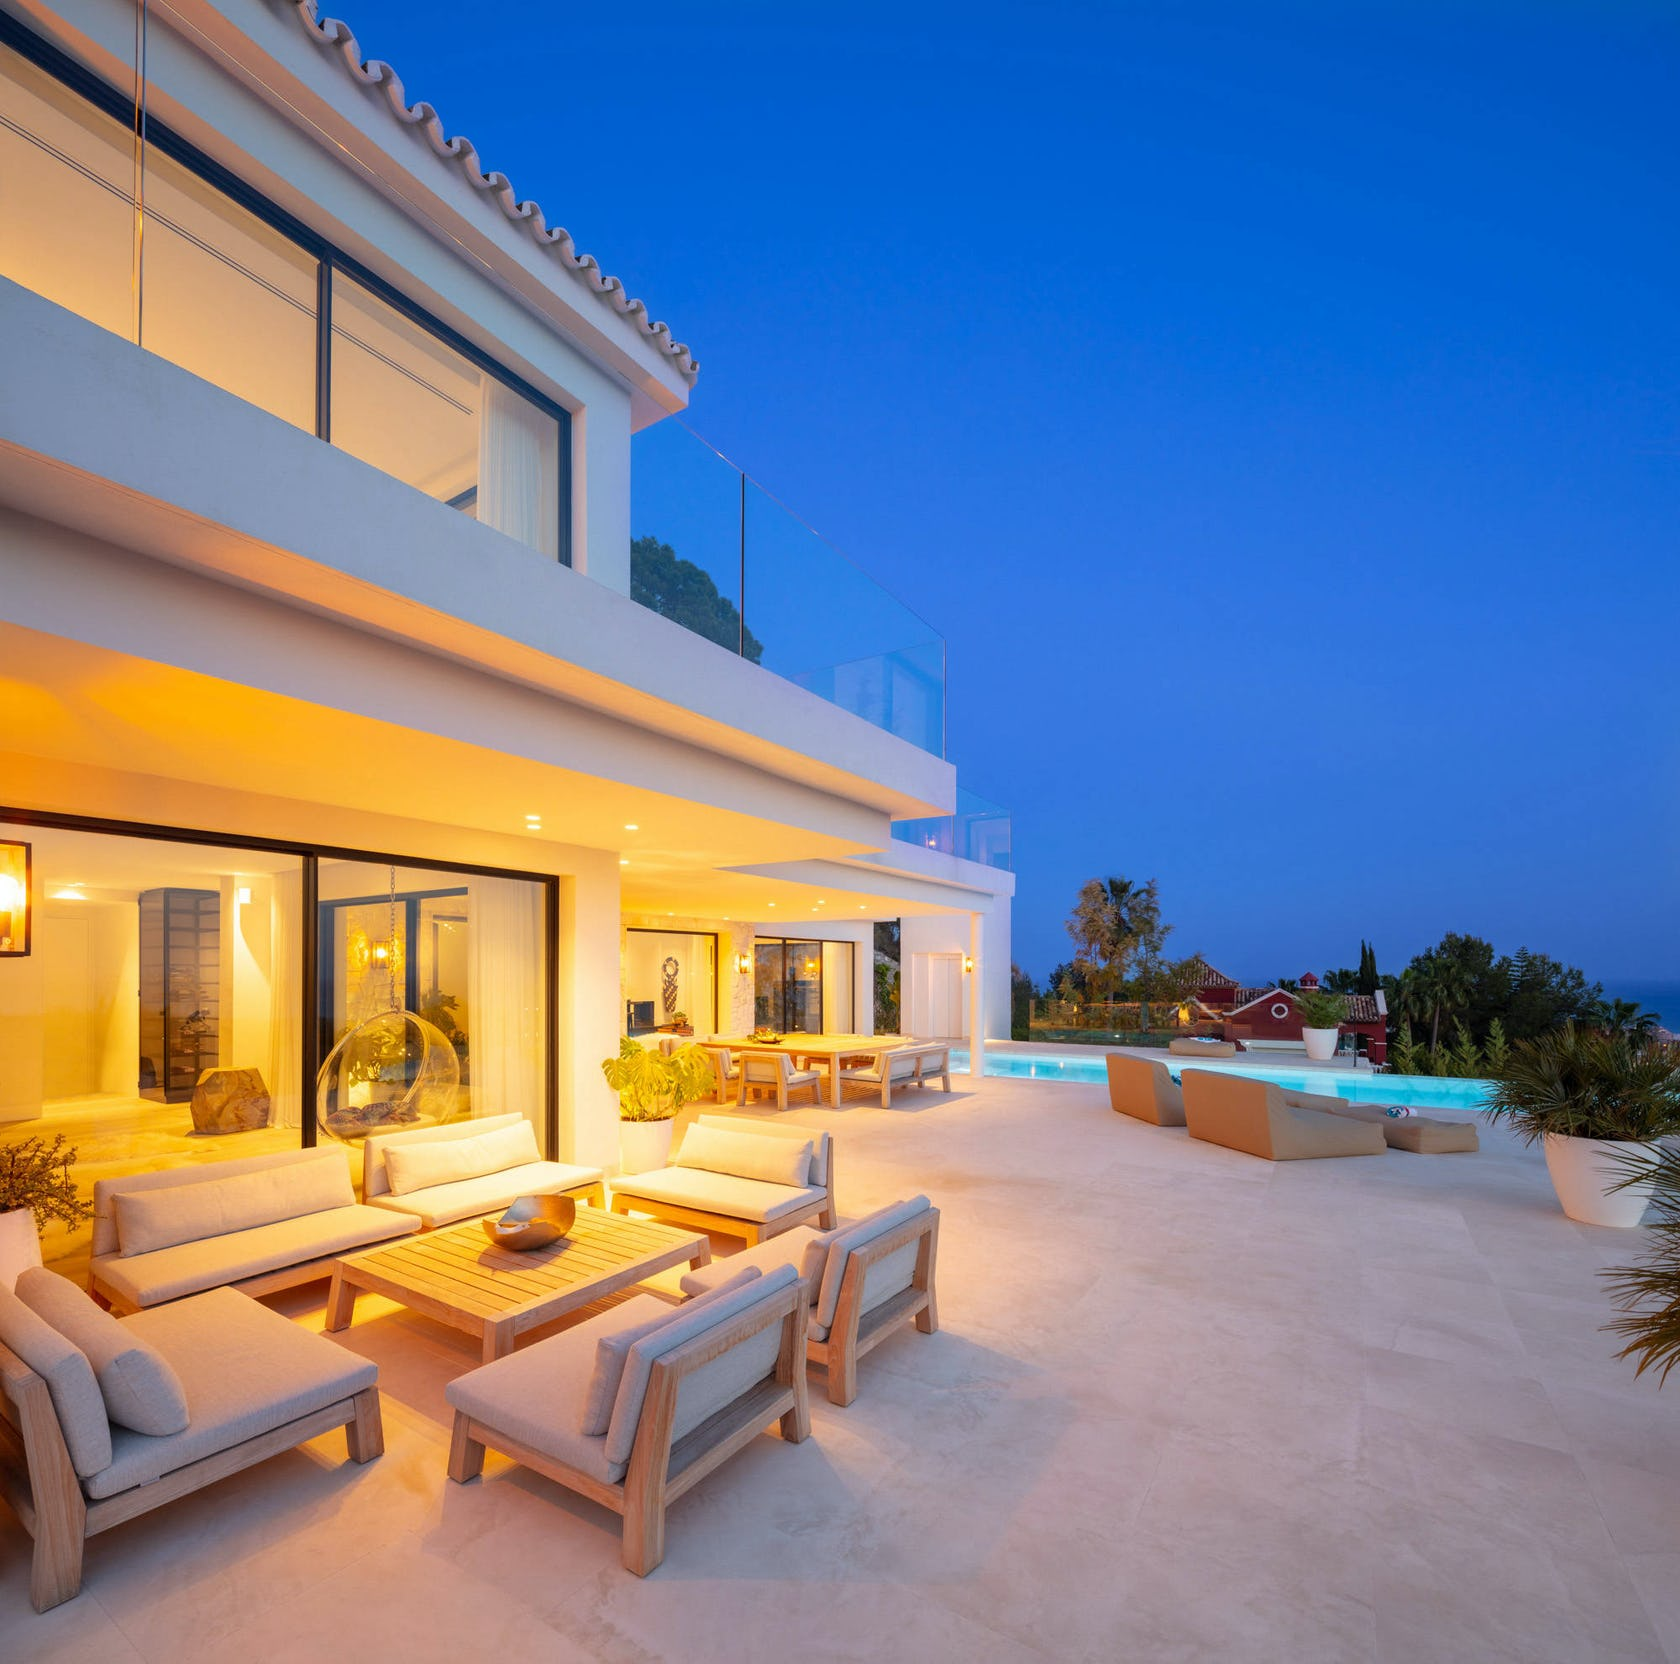 villa housing building house indoors